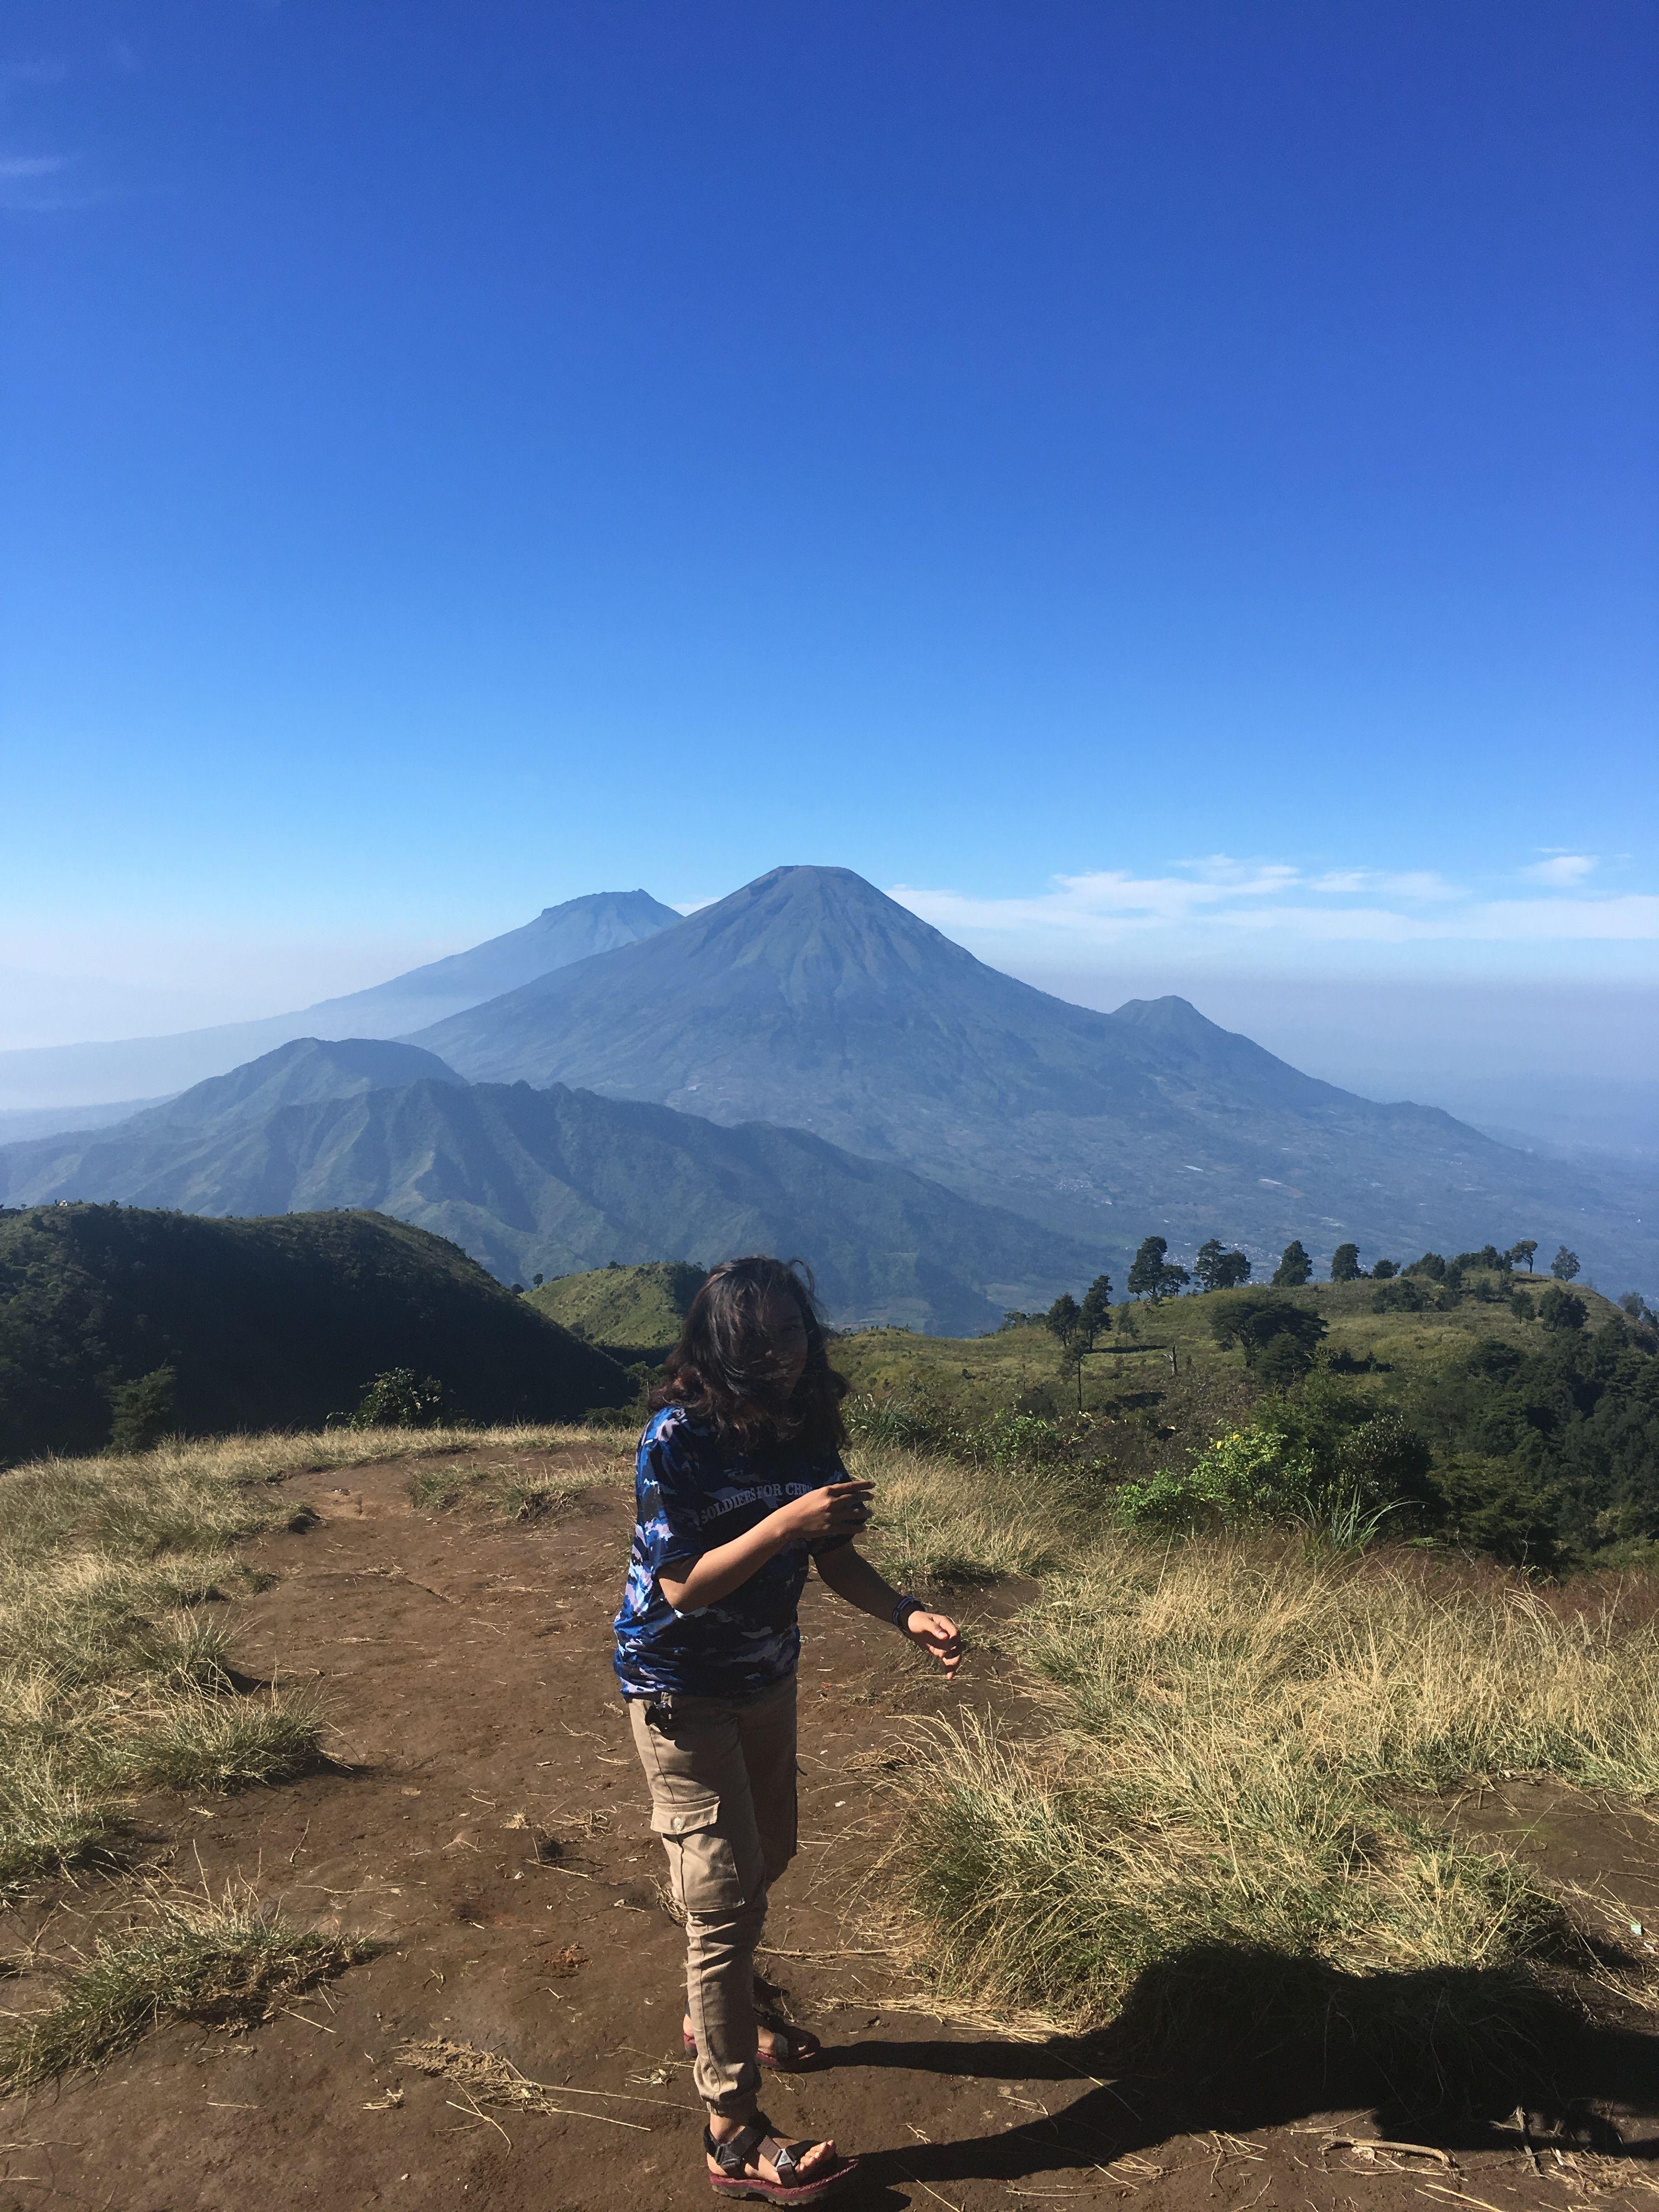 Gunung Prau Wonosobo Jawa Tengah Perjalanan Pemandangan Fotografi